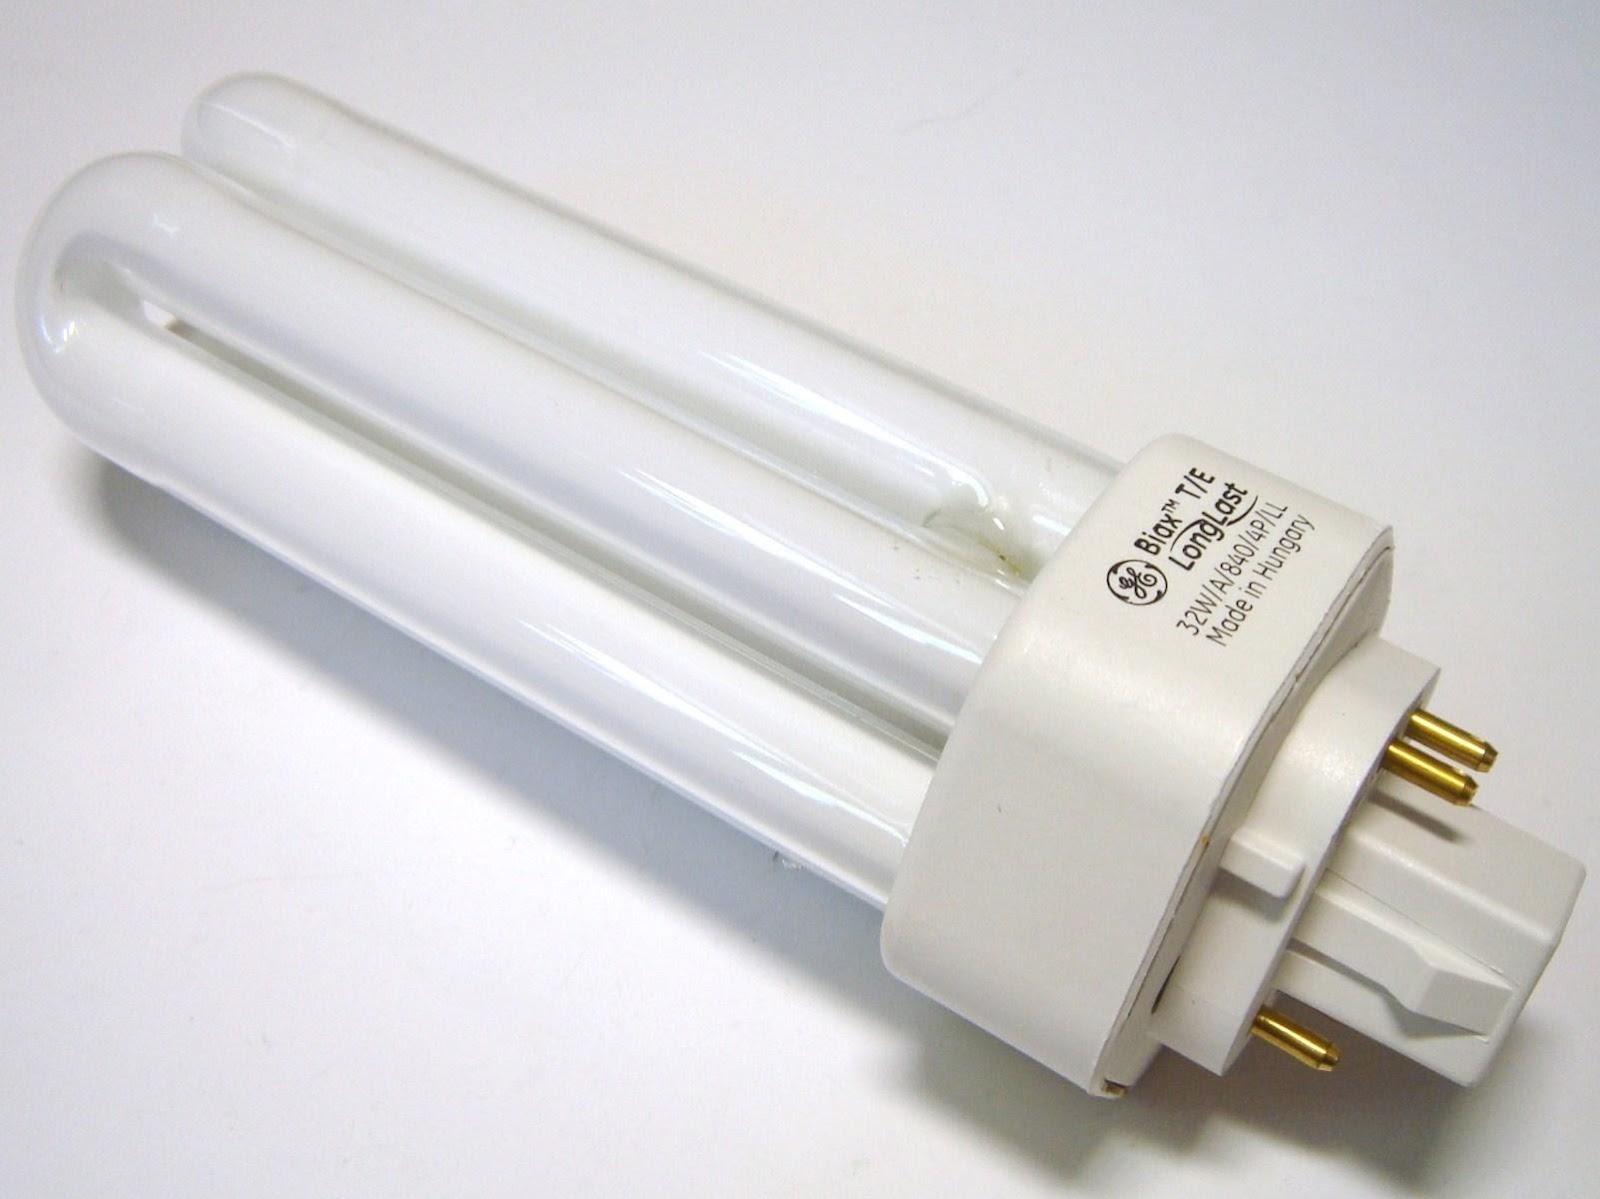 https://www.elektrikaup.ee/cache/elektrikaup/public/shop_product_img/_1800x1200x0/4877_16982_lamp_32w_002.JPG